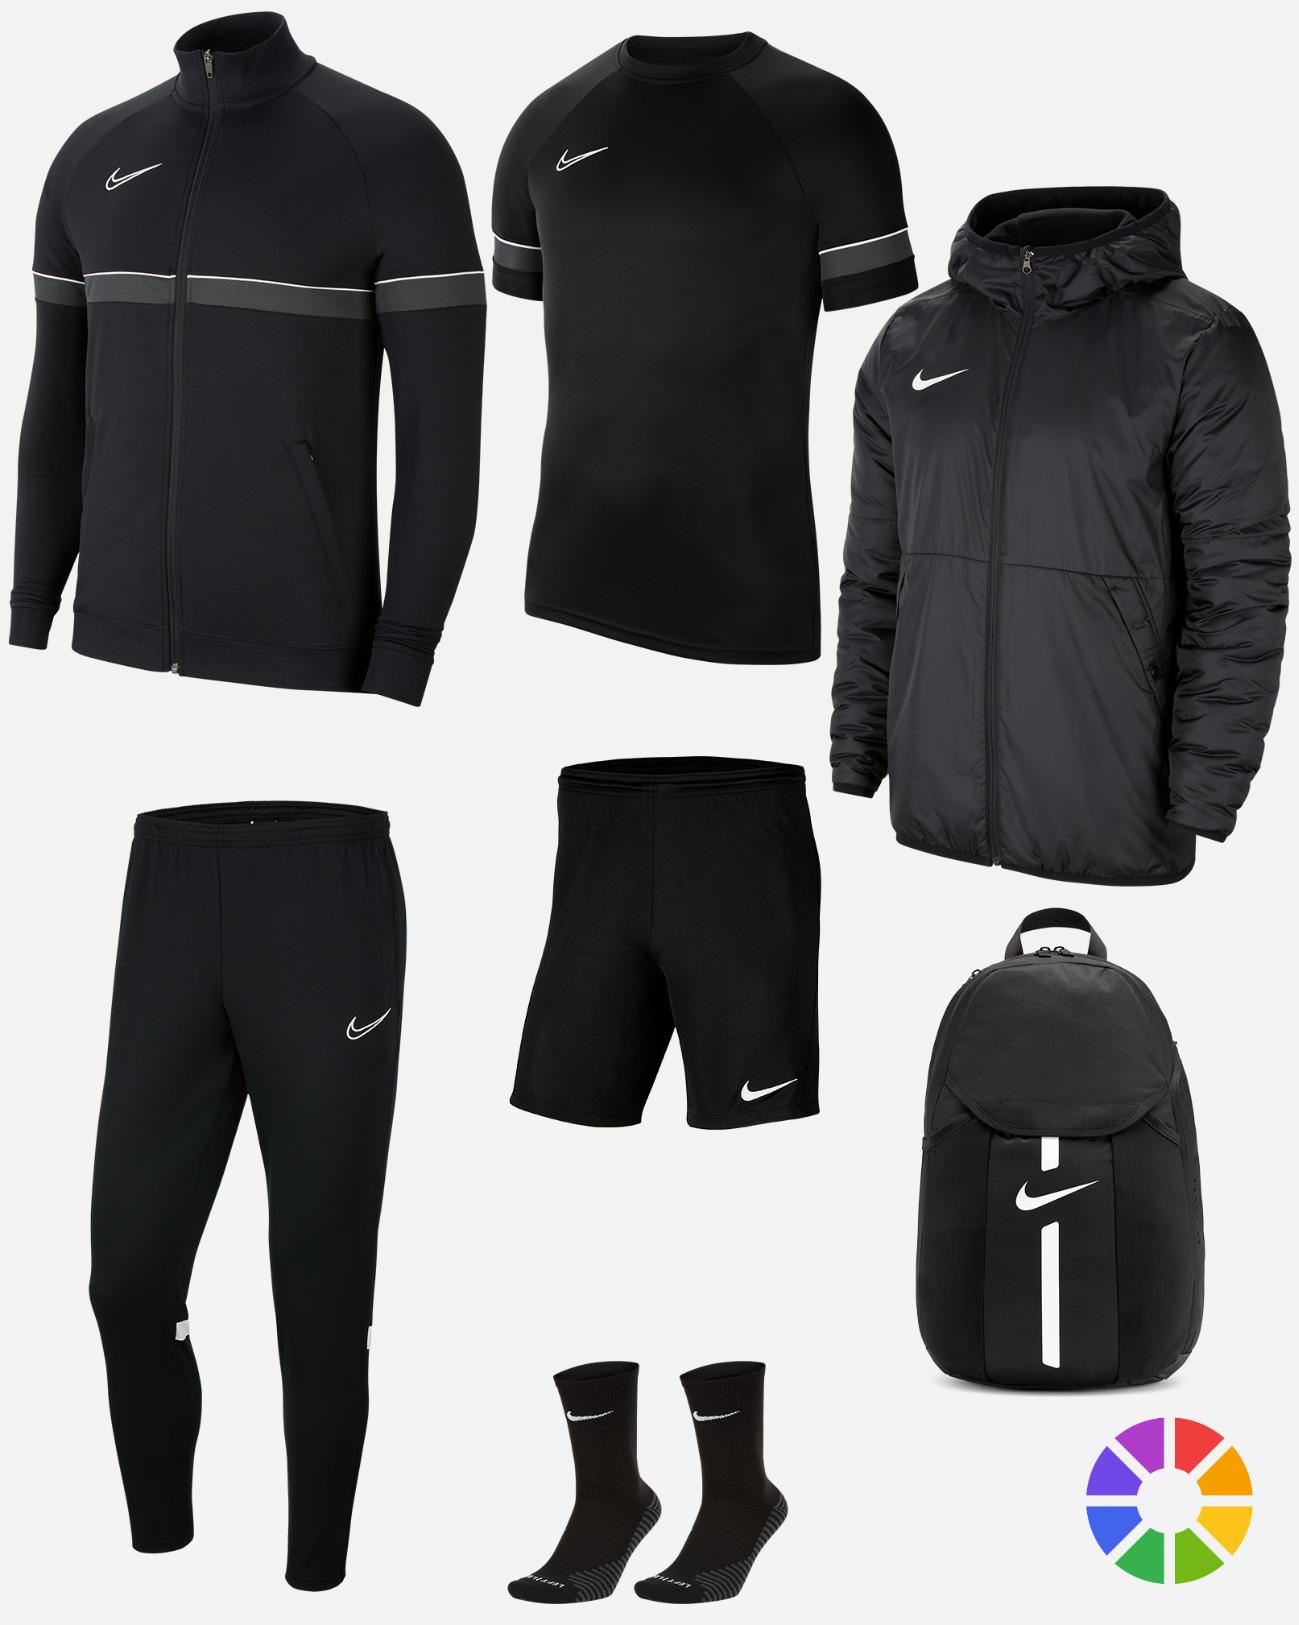 Packs et ensembles Nike